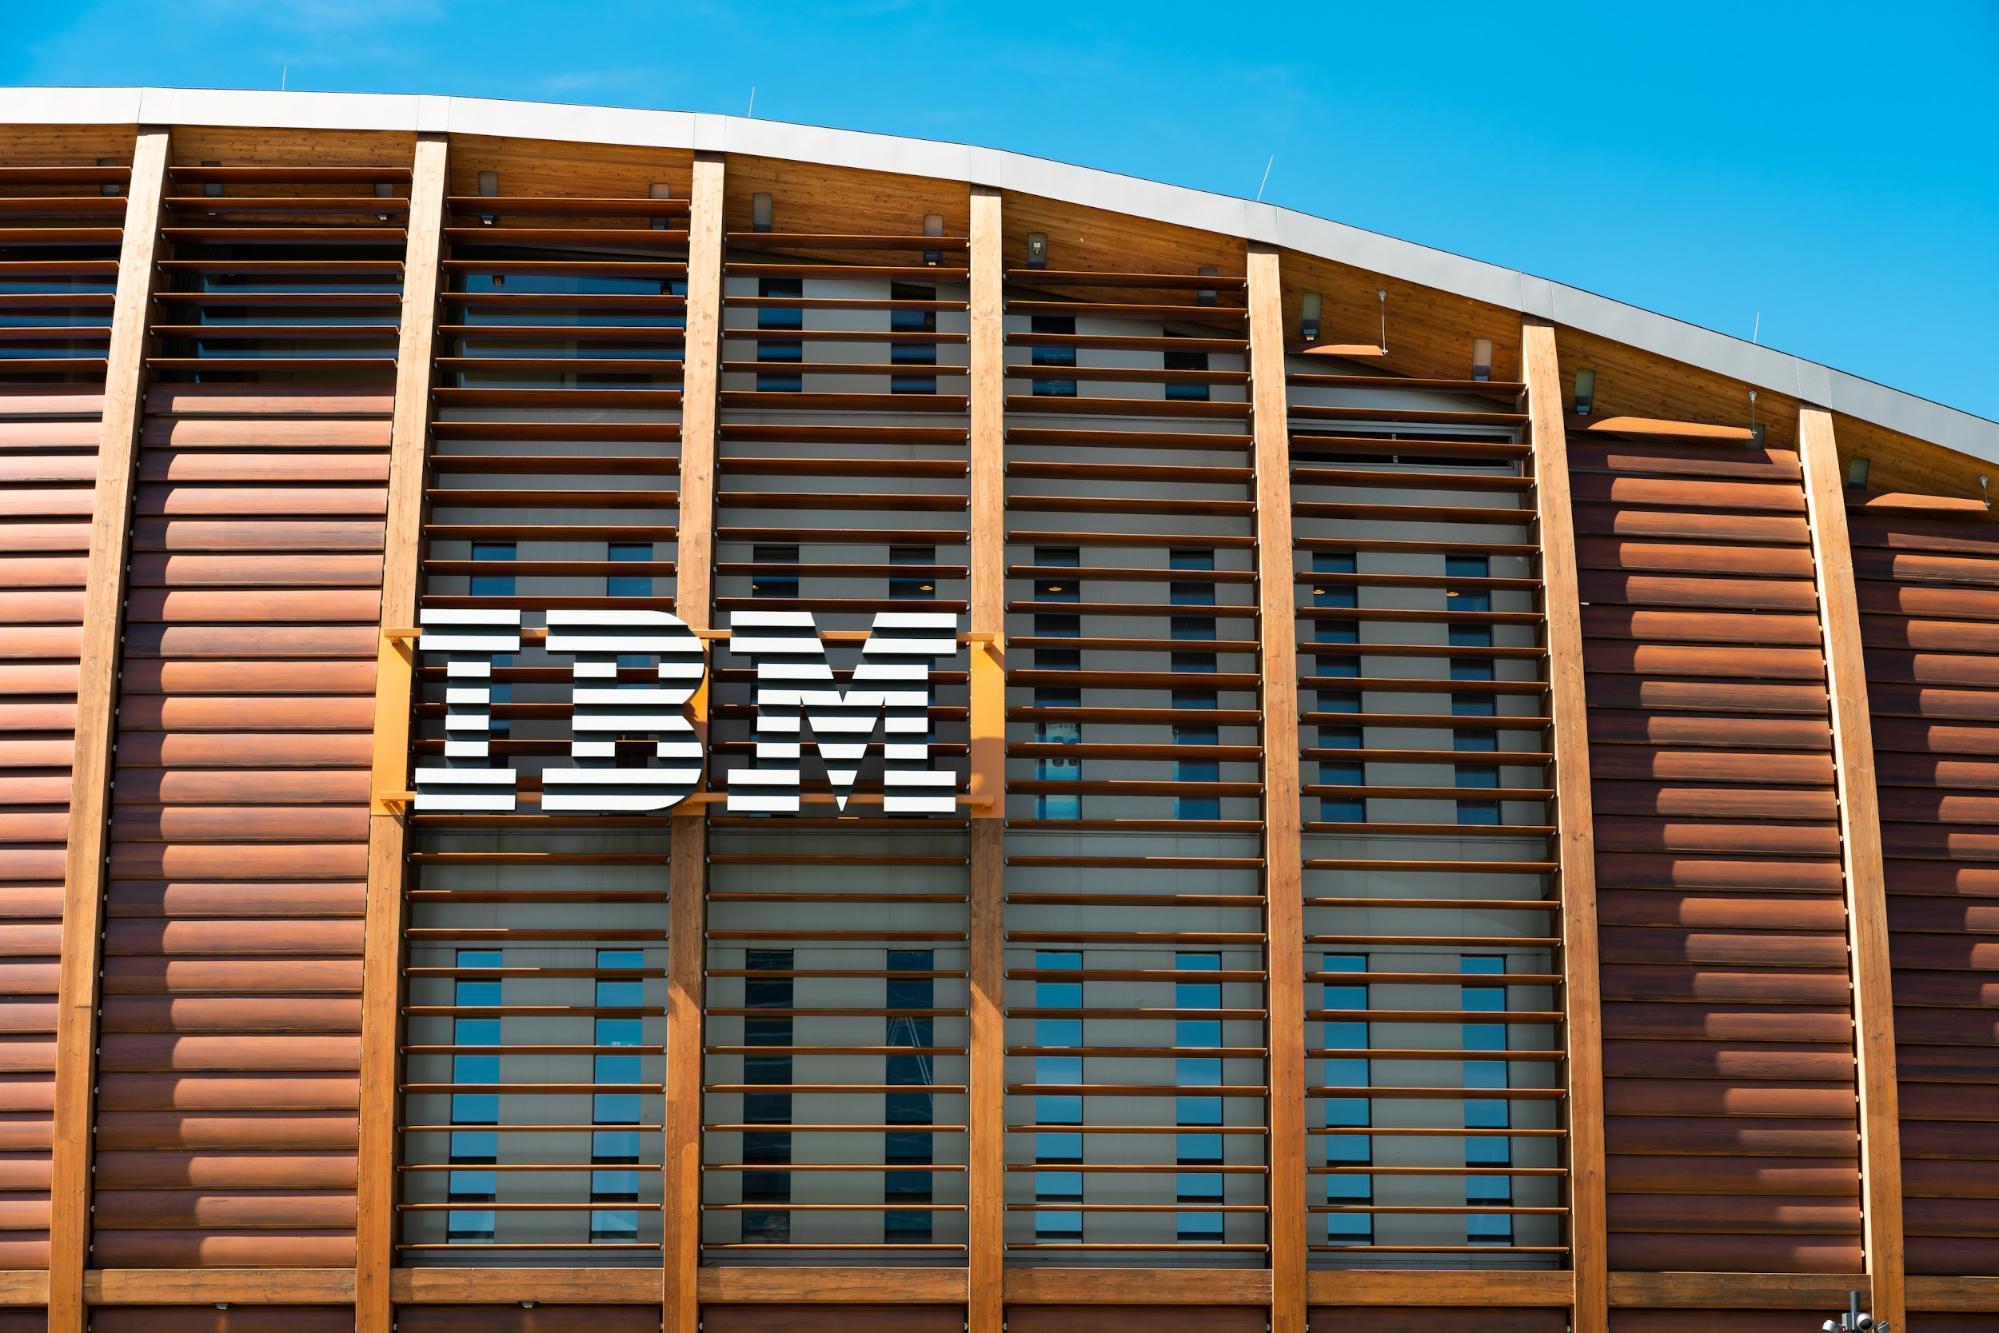 IBM internship: IBM front building